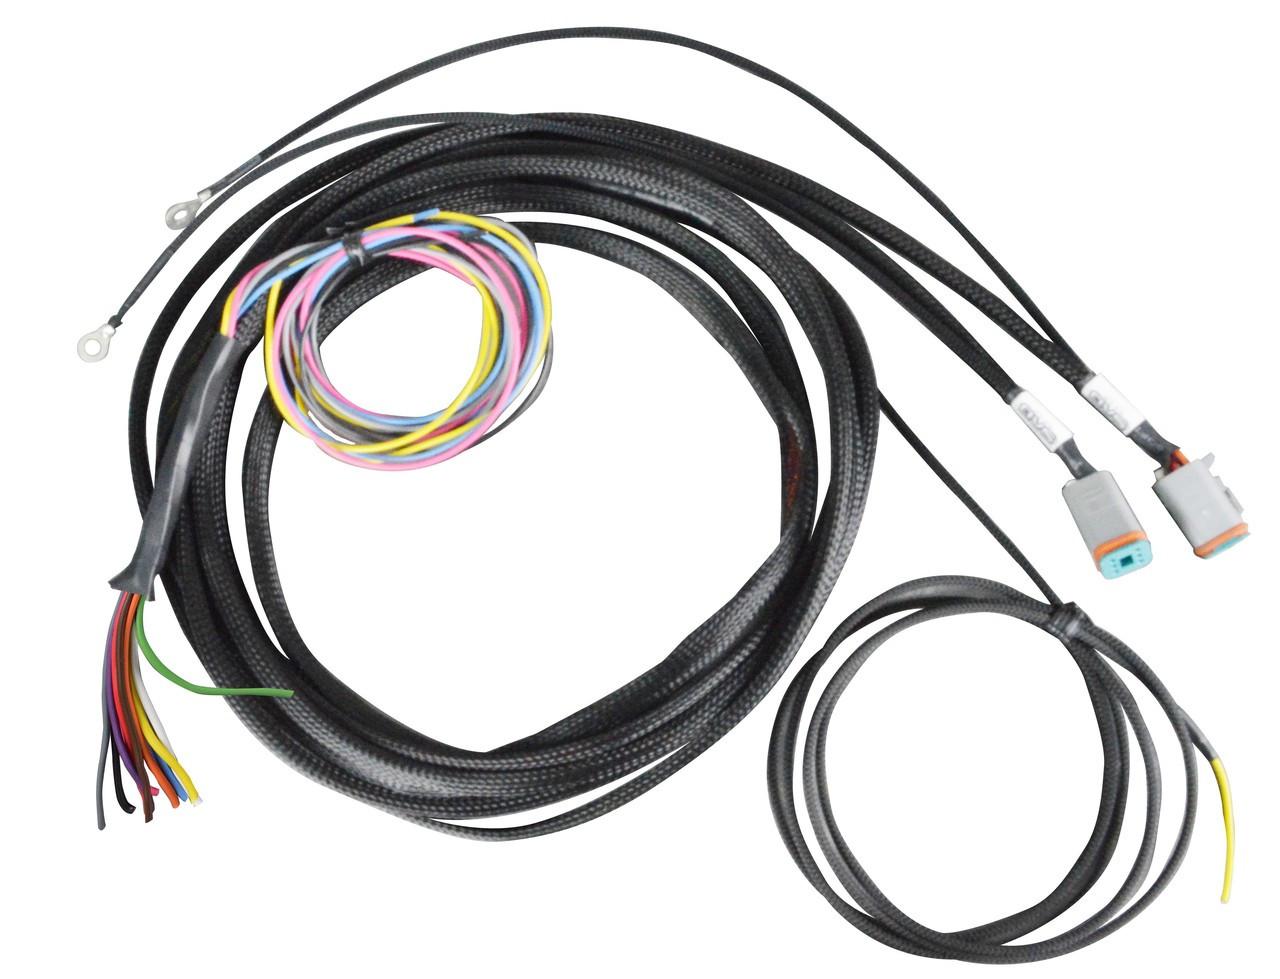 medium resolution of avs valve wiring harness 12 17 22 accuair endo